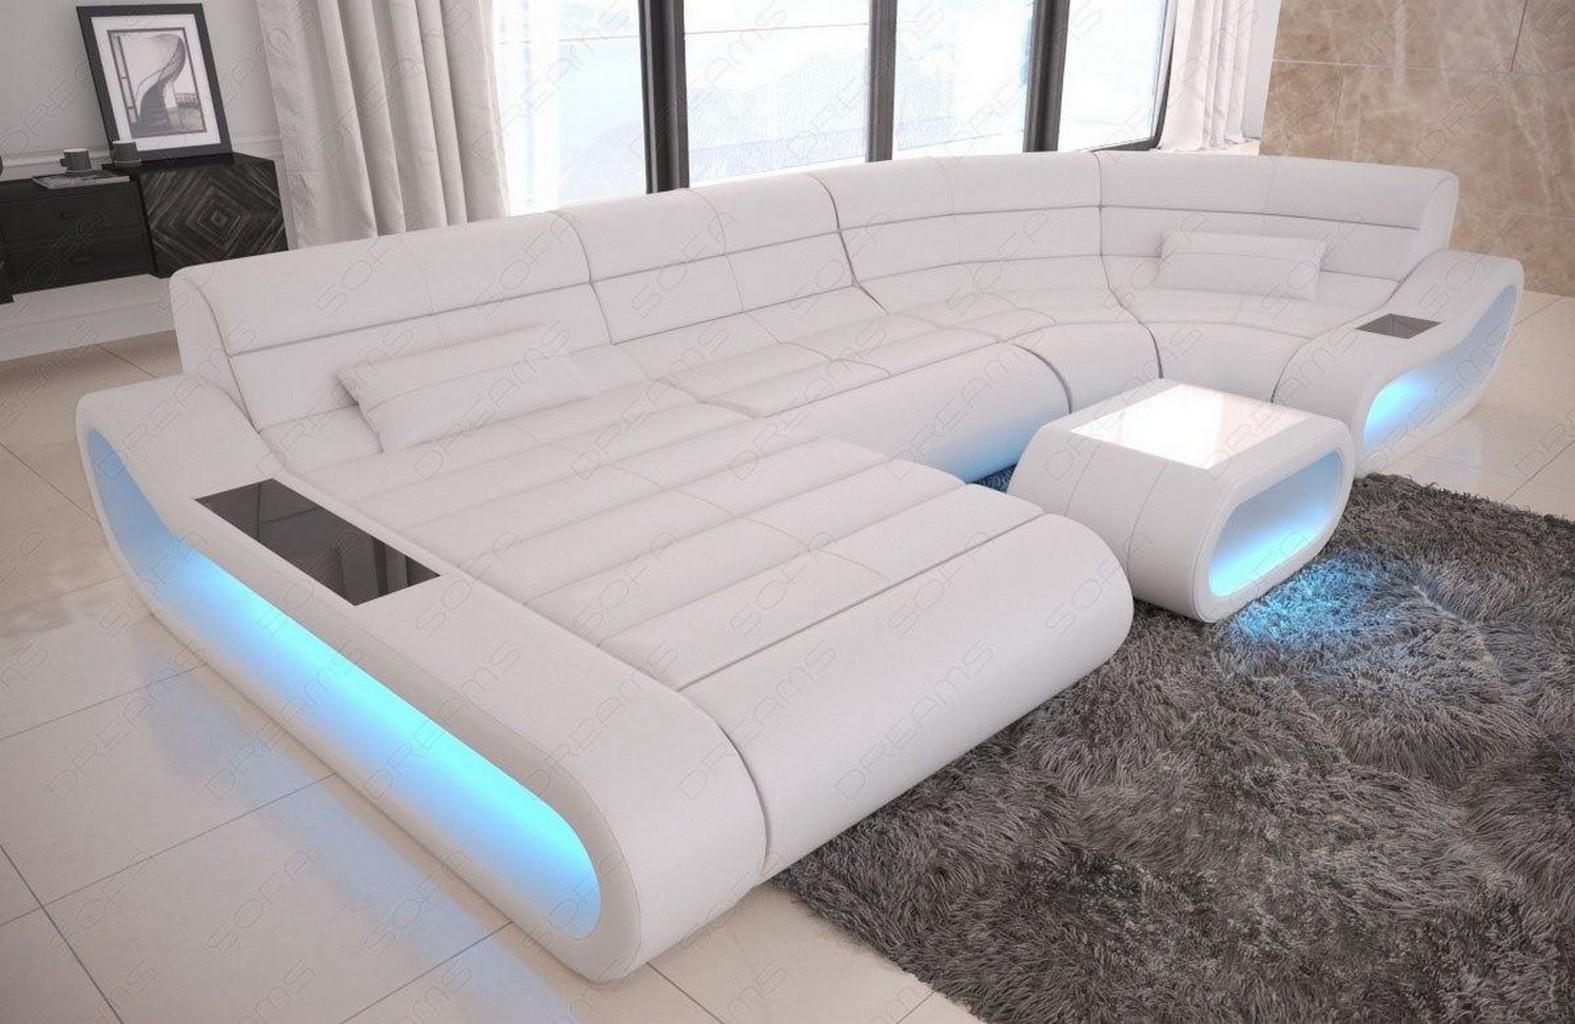 Designer Sofas Leder design leder sofa cipriani die feinste sammlung home design